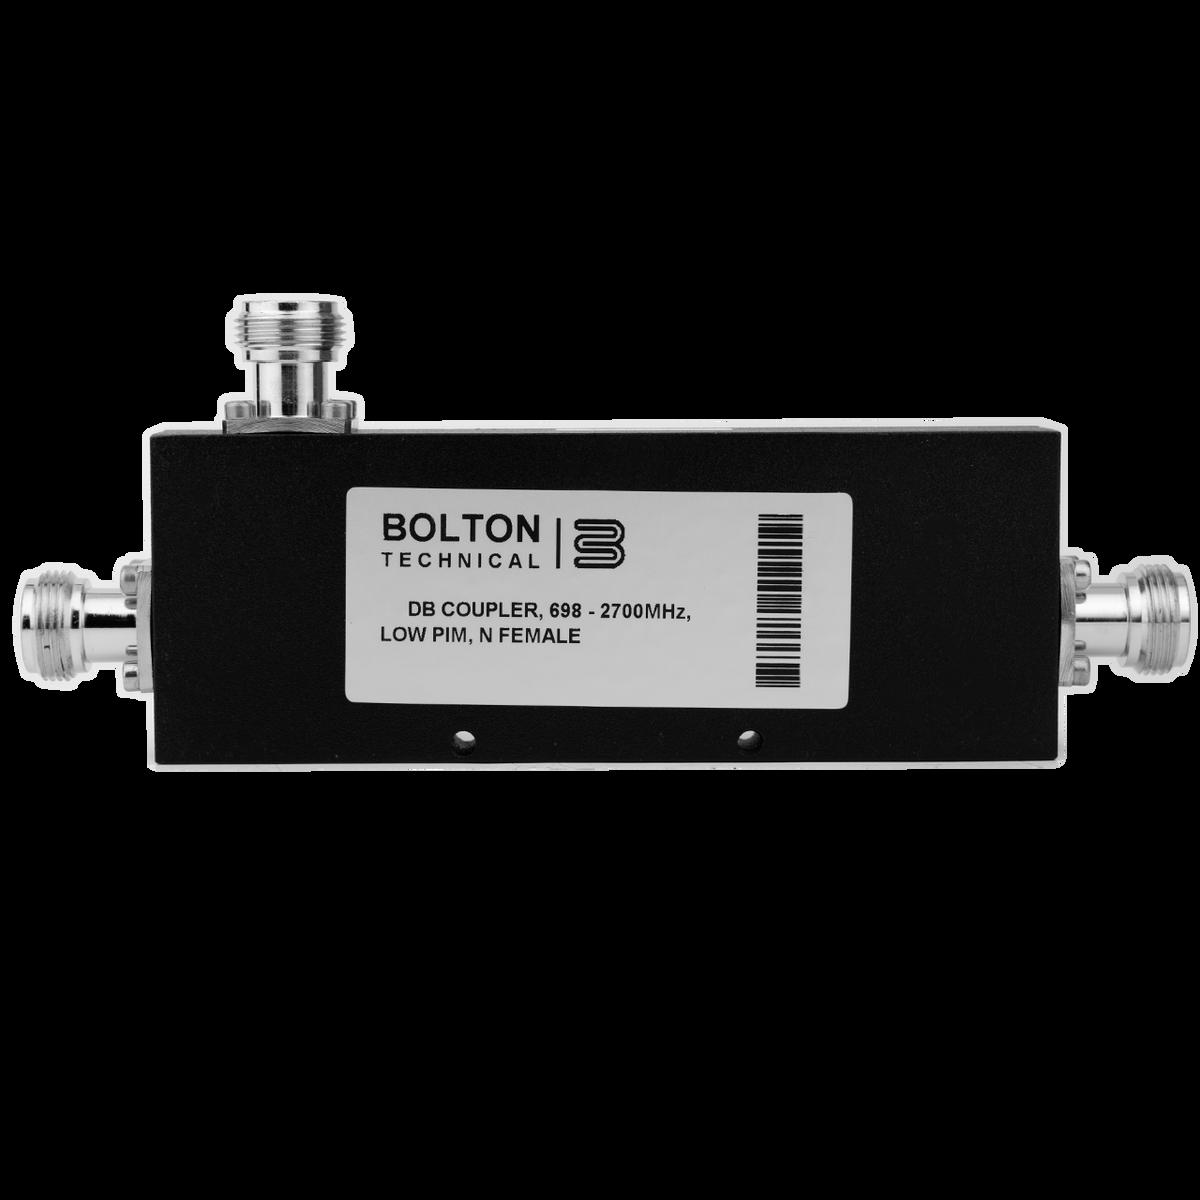 Bolton Technical 10 dB Coupler, 698-2700 MHz, Low-PIM, N-Female